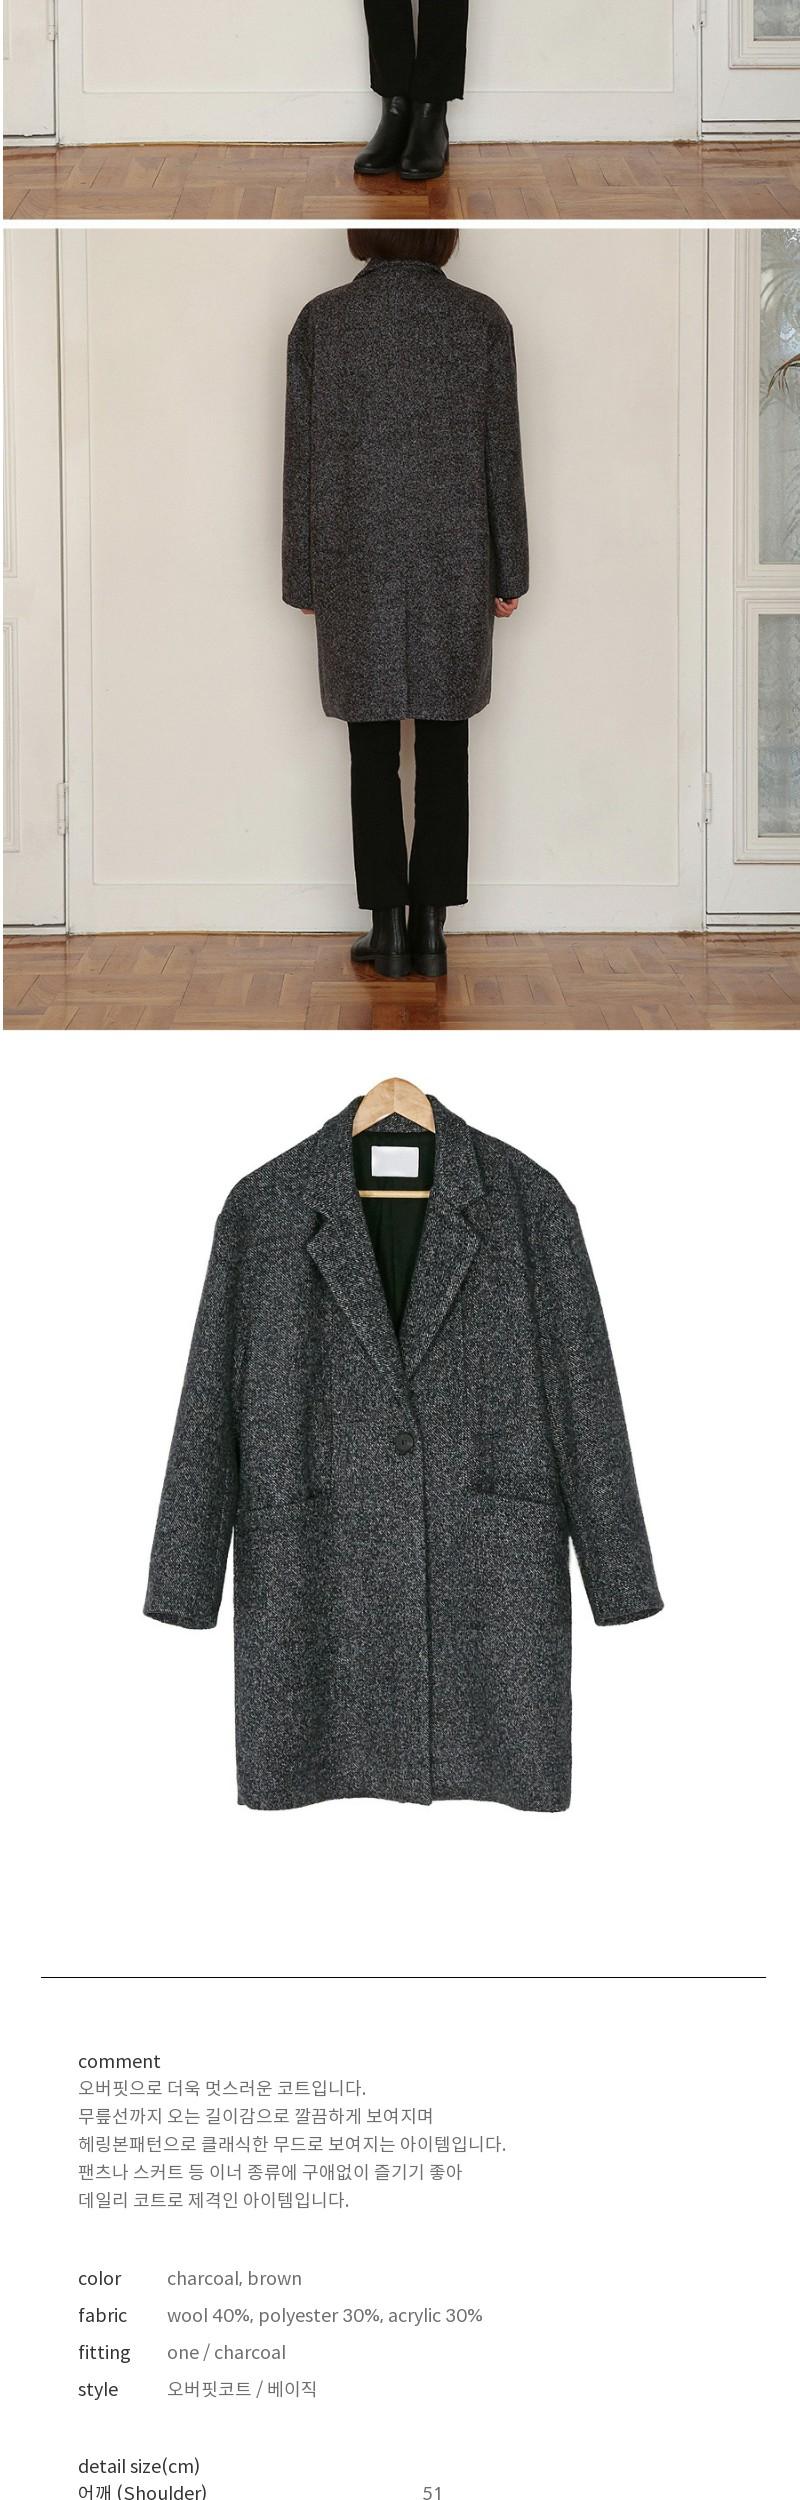 grand over fit coat